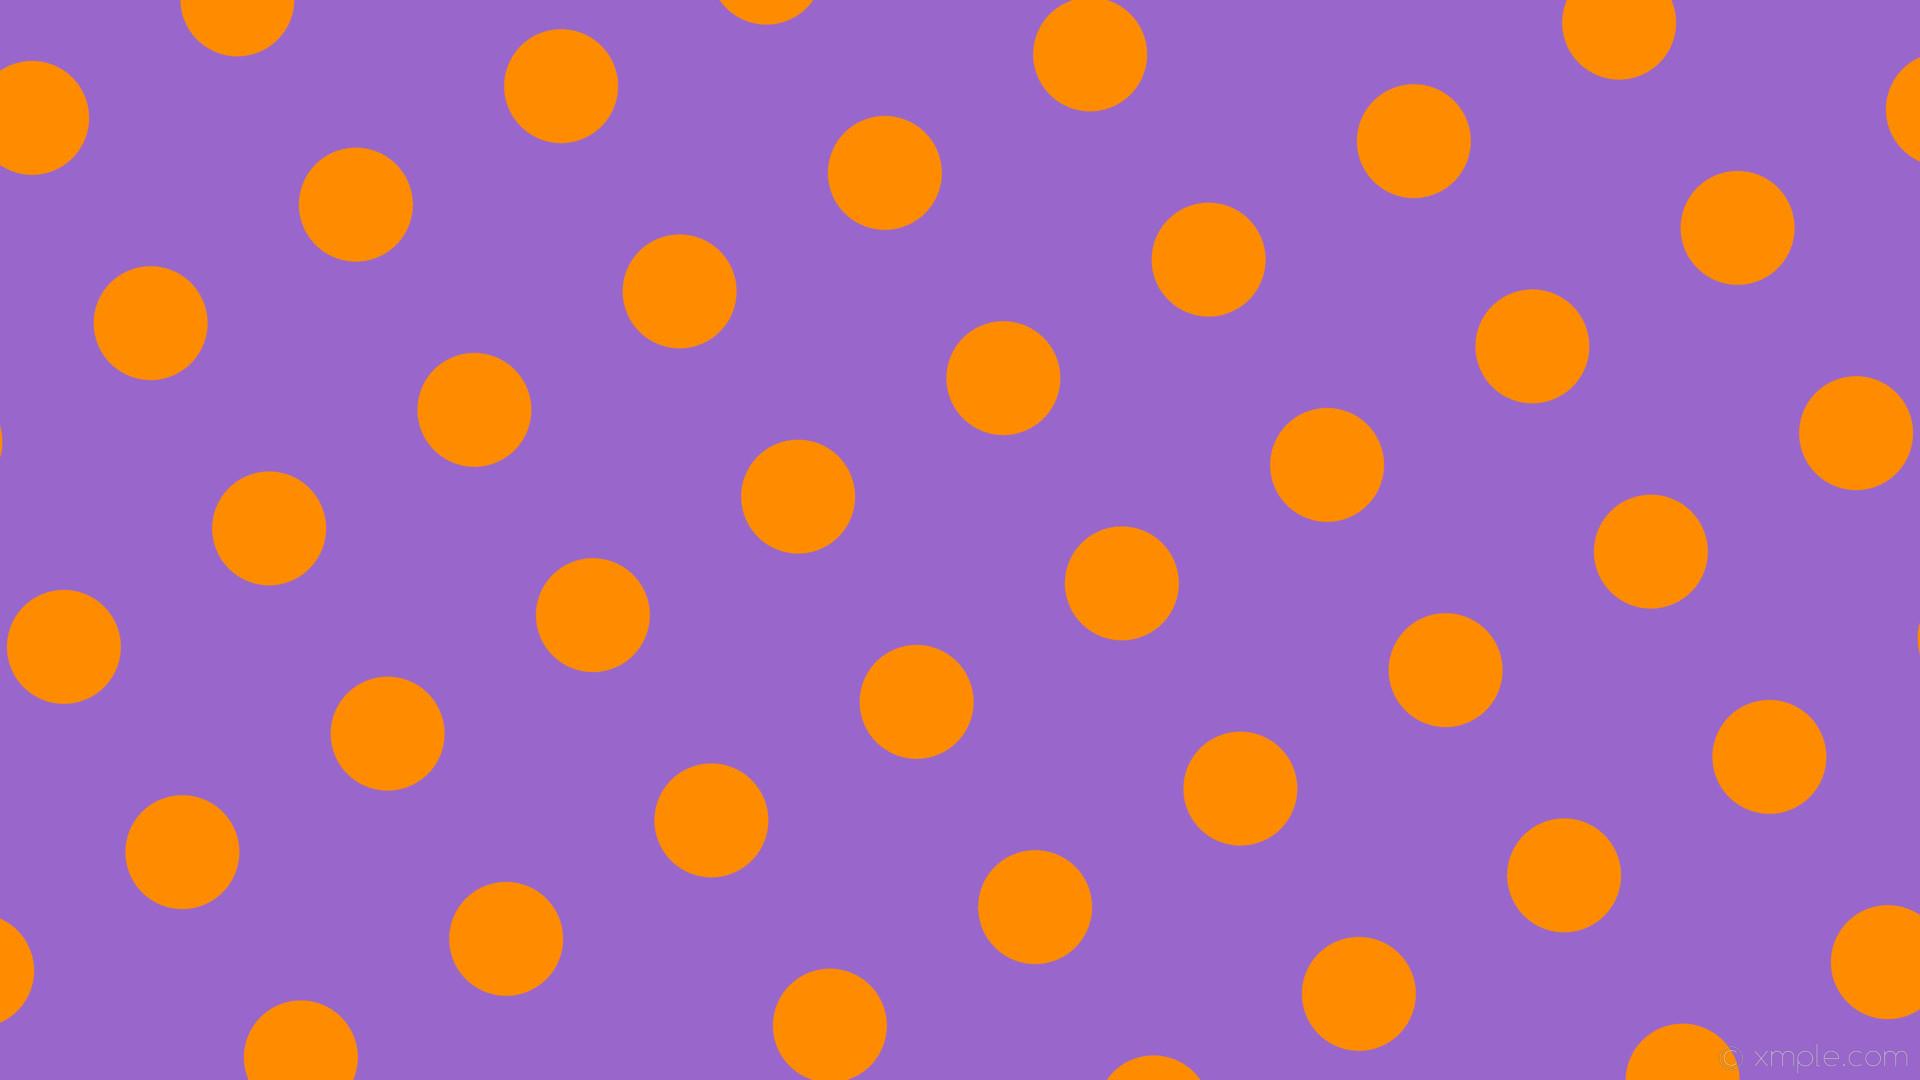 wallpaper purple orange polka dots spots amethyst dark orange #9966cc  #ff8c00 210° 114px